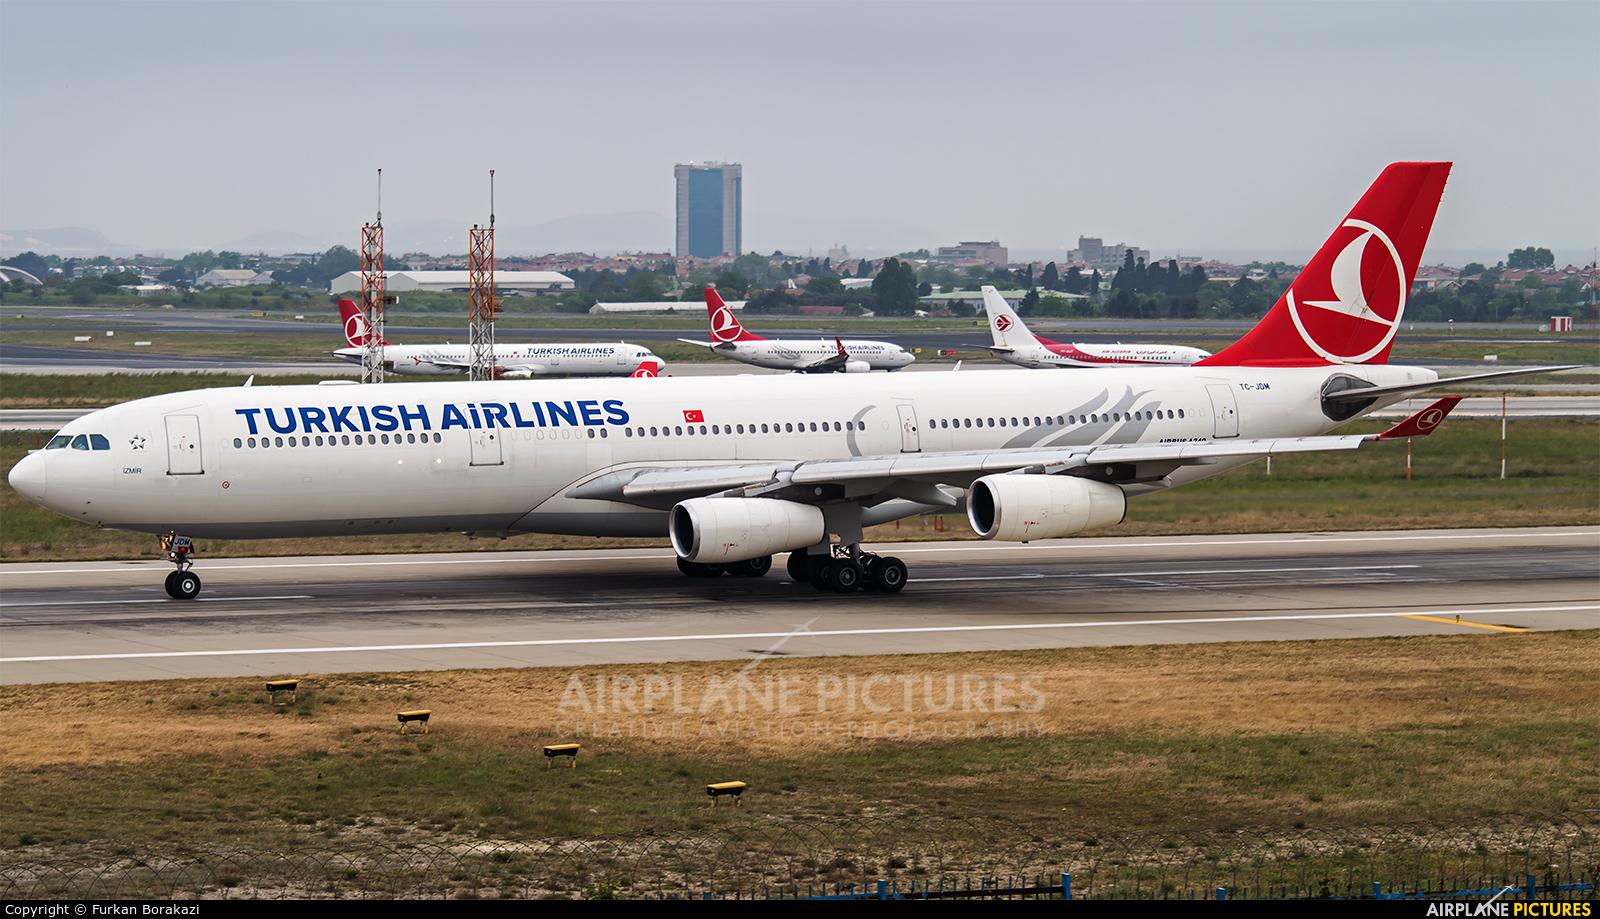 Turkish Airlines TC-JDM aircraft at Istanbul - Ataturk